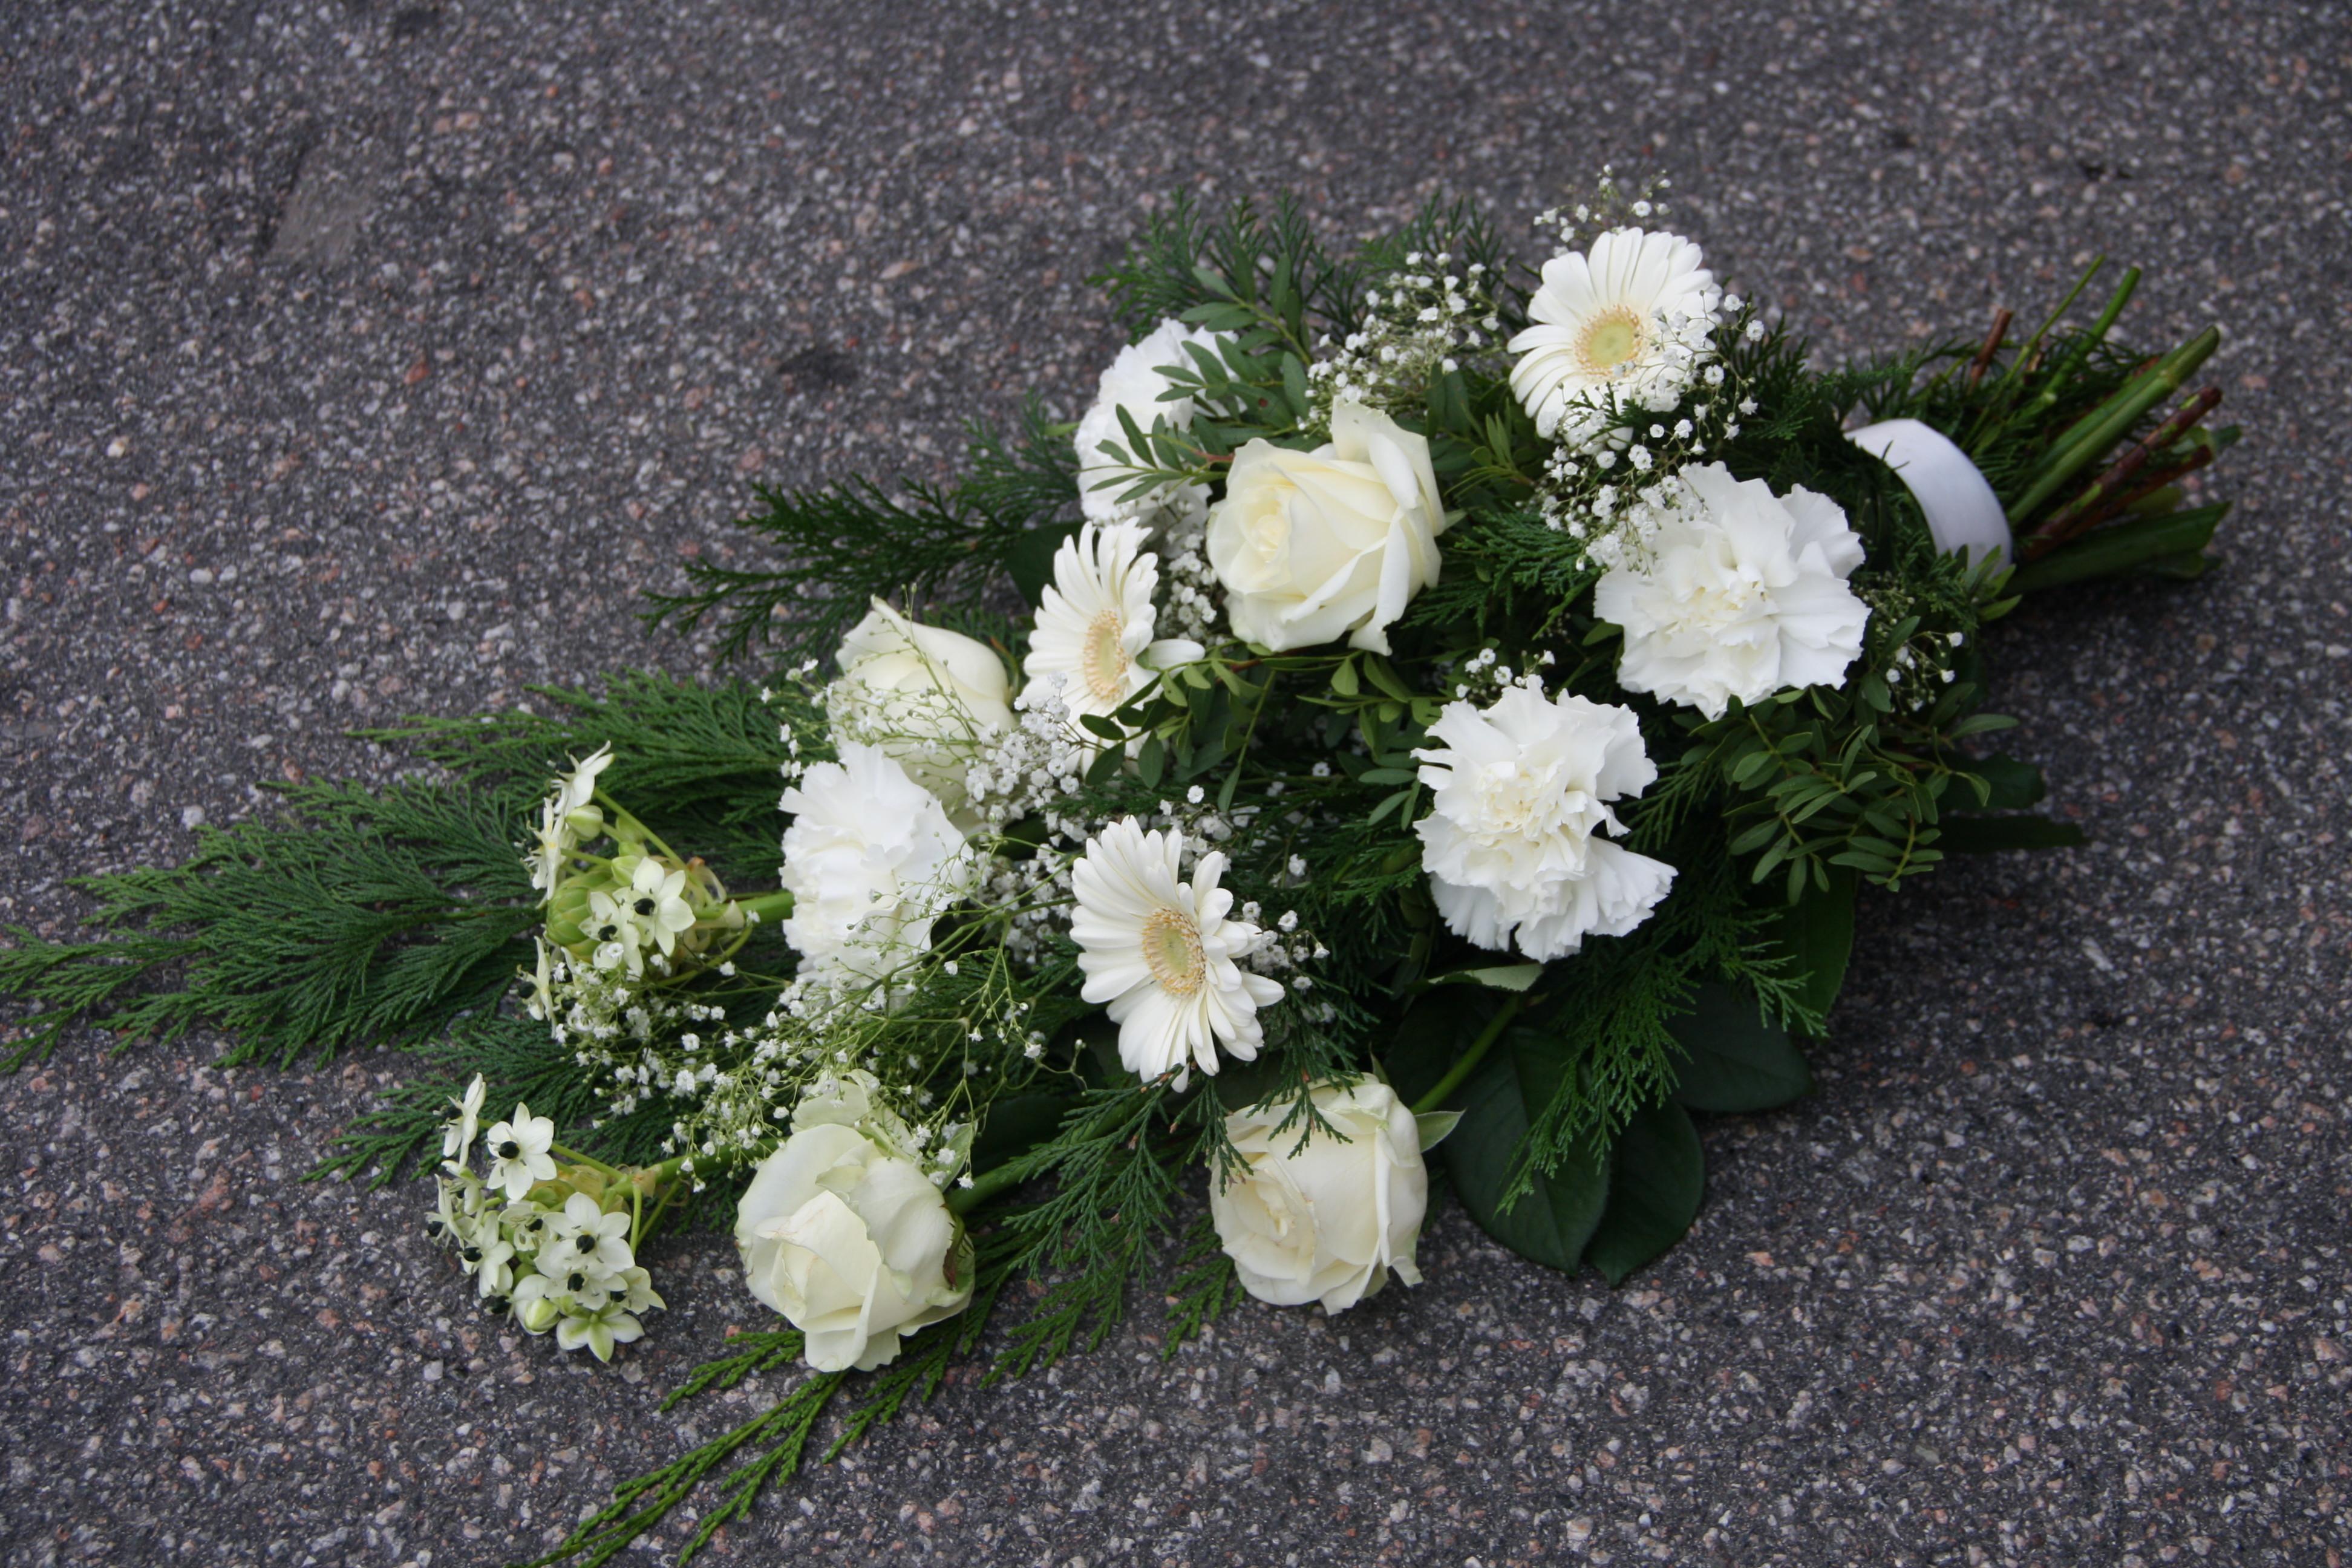 Begravning2